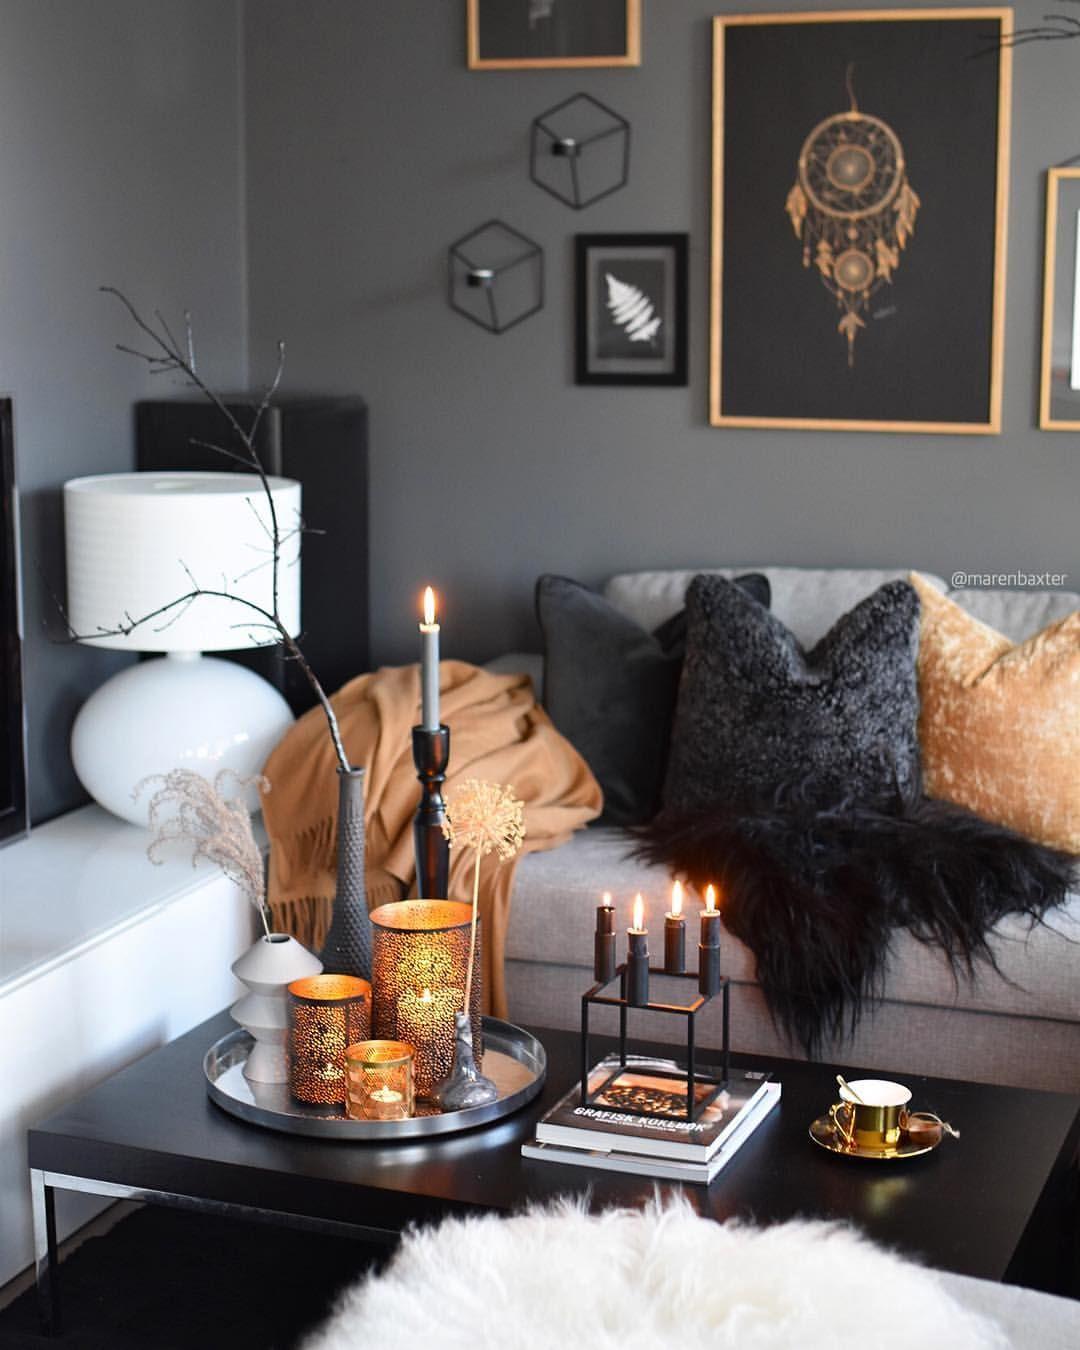 868 Gilla Markeringar 25 Kommentarer Maren Baxter Marenbaxter Pa Instagram Good Morn Living Room Decor On A Budget Living Room Decor Cozy Living Decor